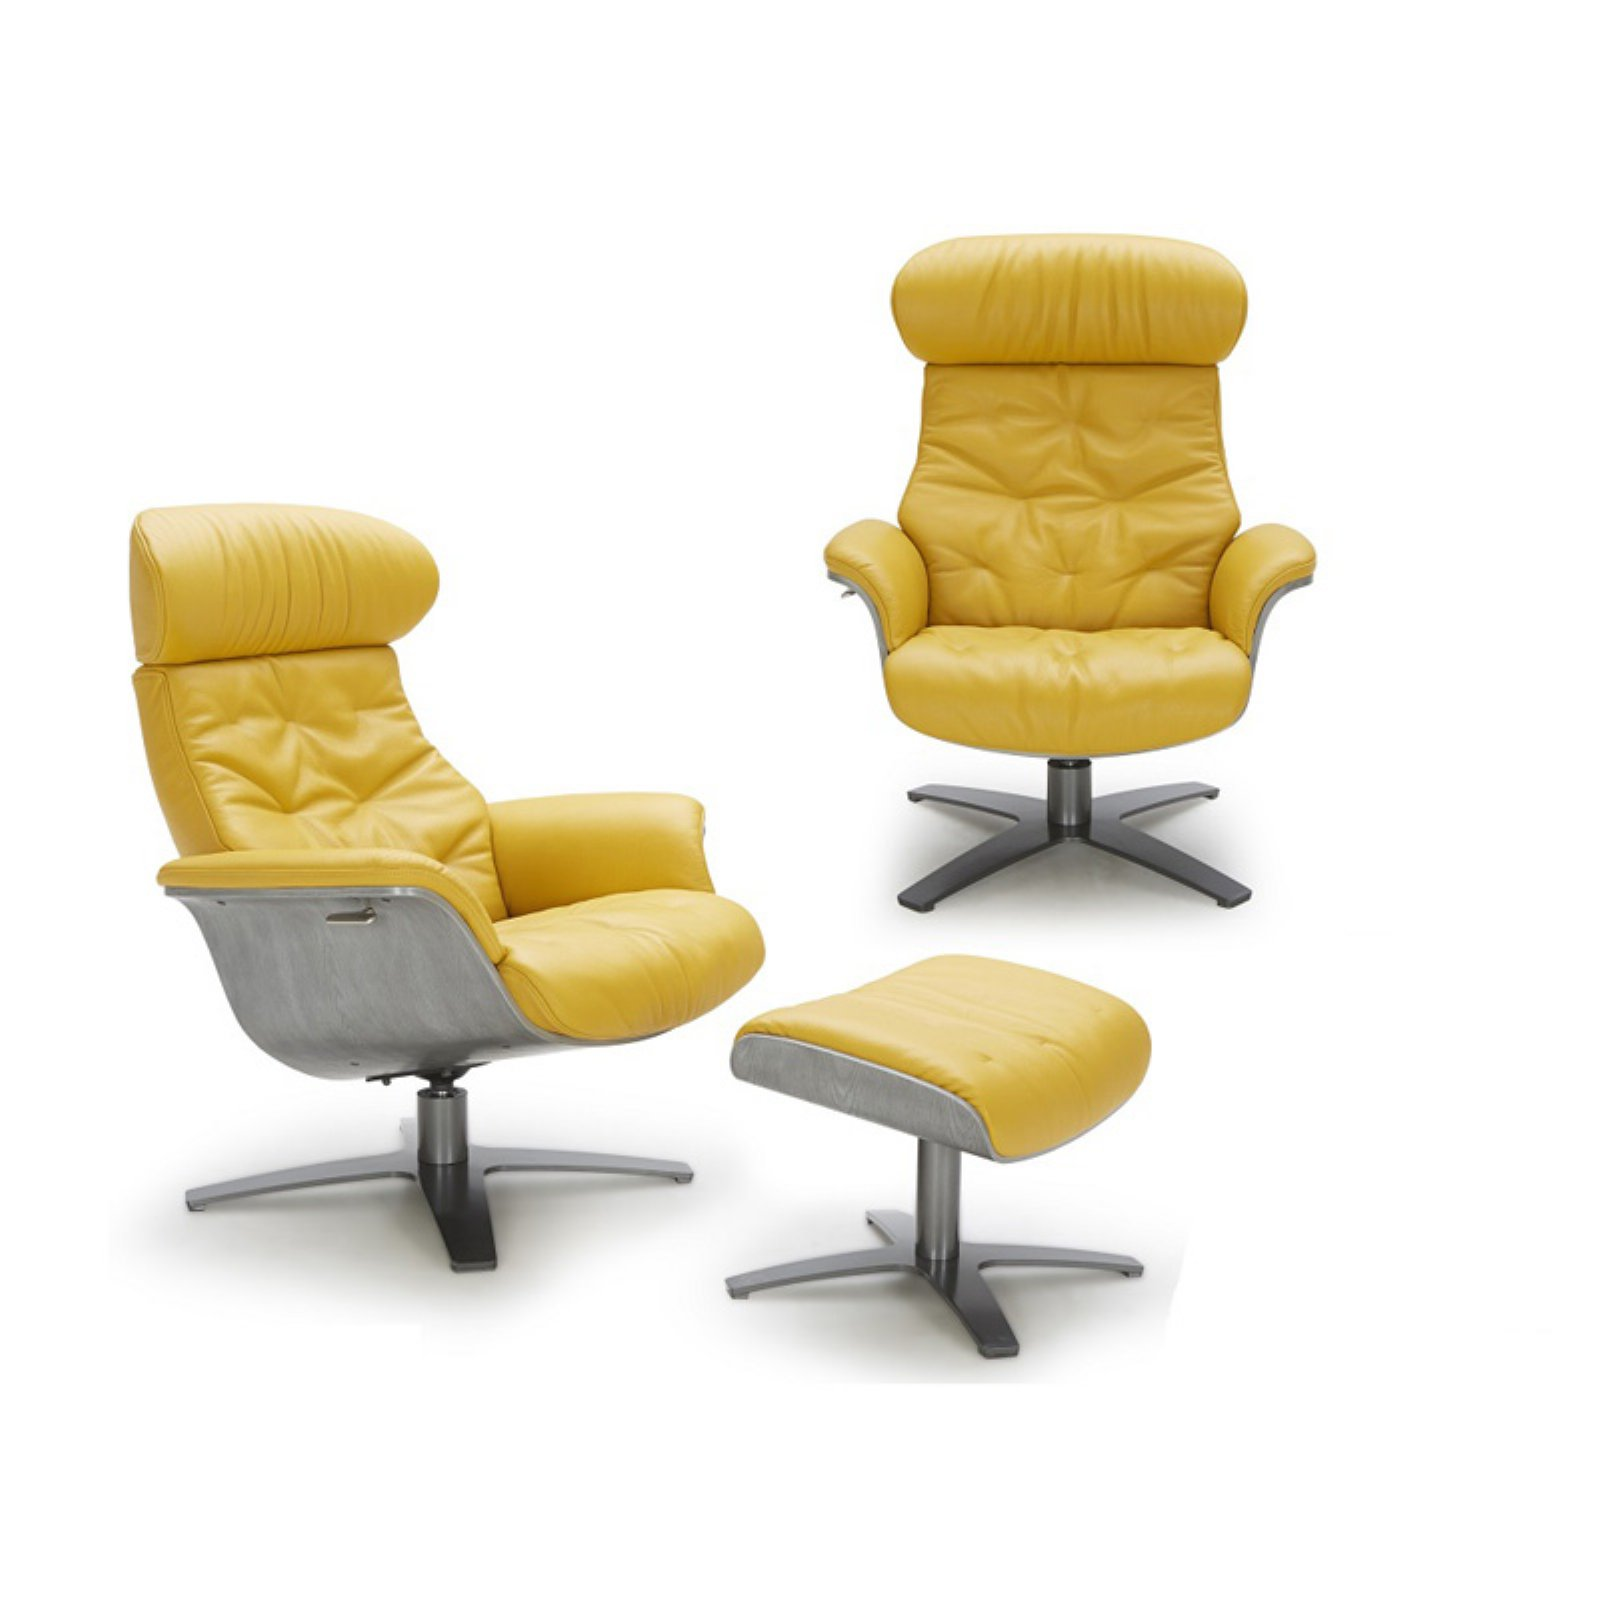 J&M Furniture Karma Accent Chair